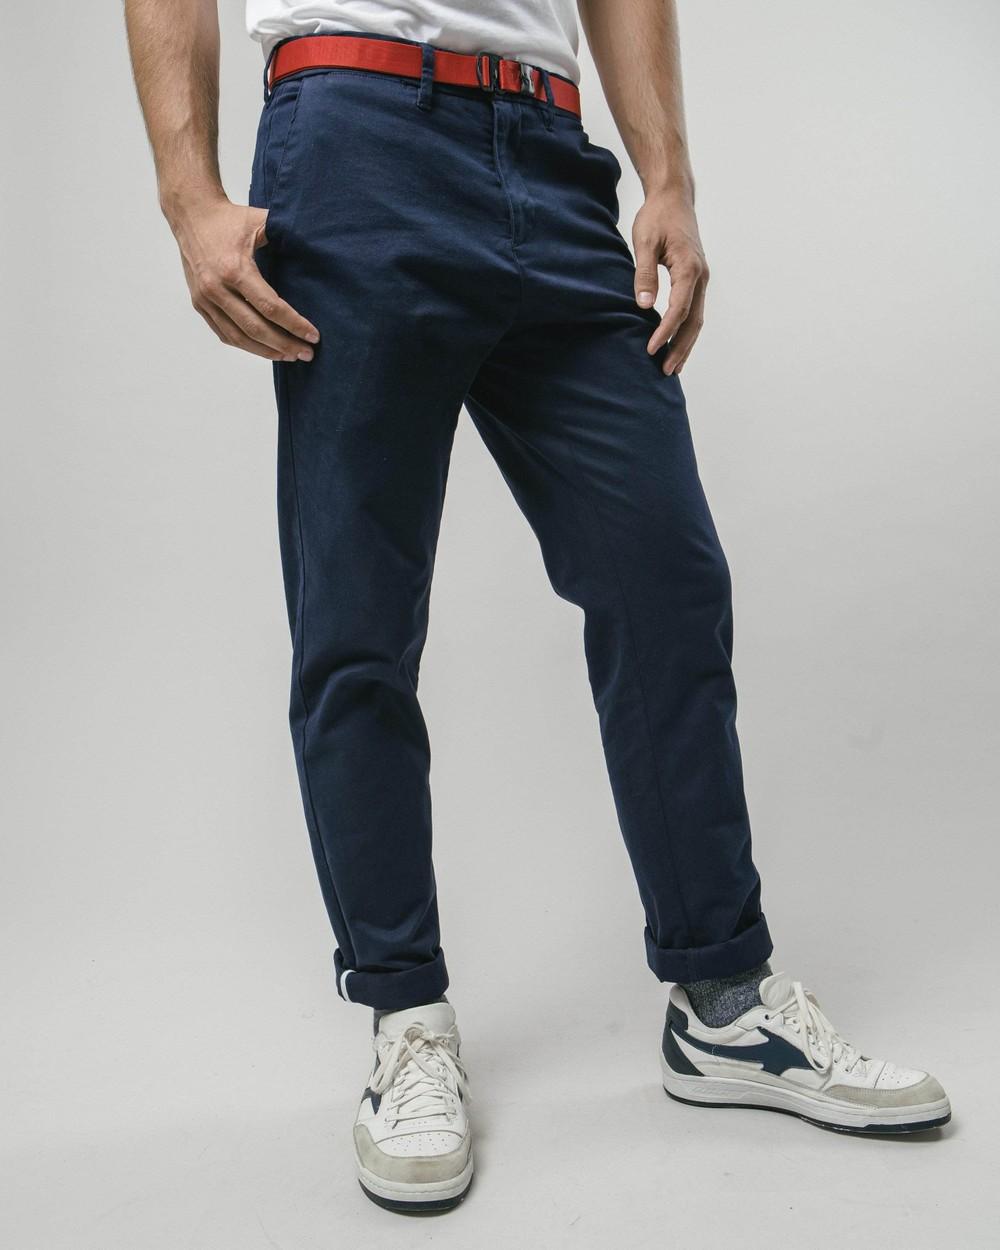 Sumo boy navy chino pants - Brava Fabrics